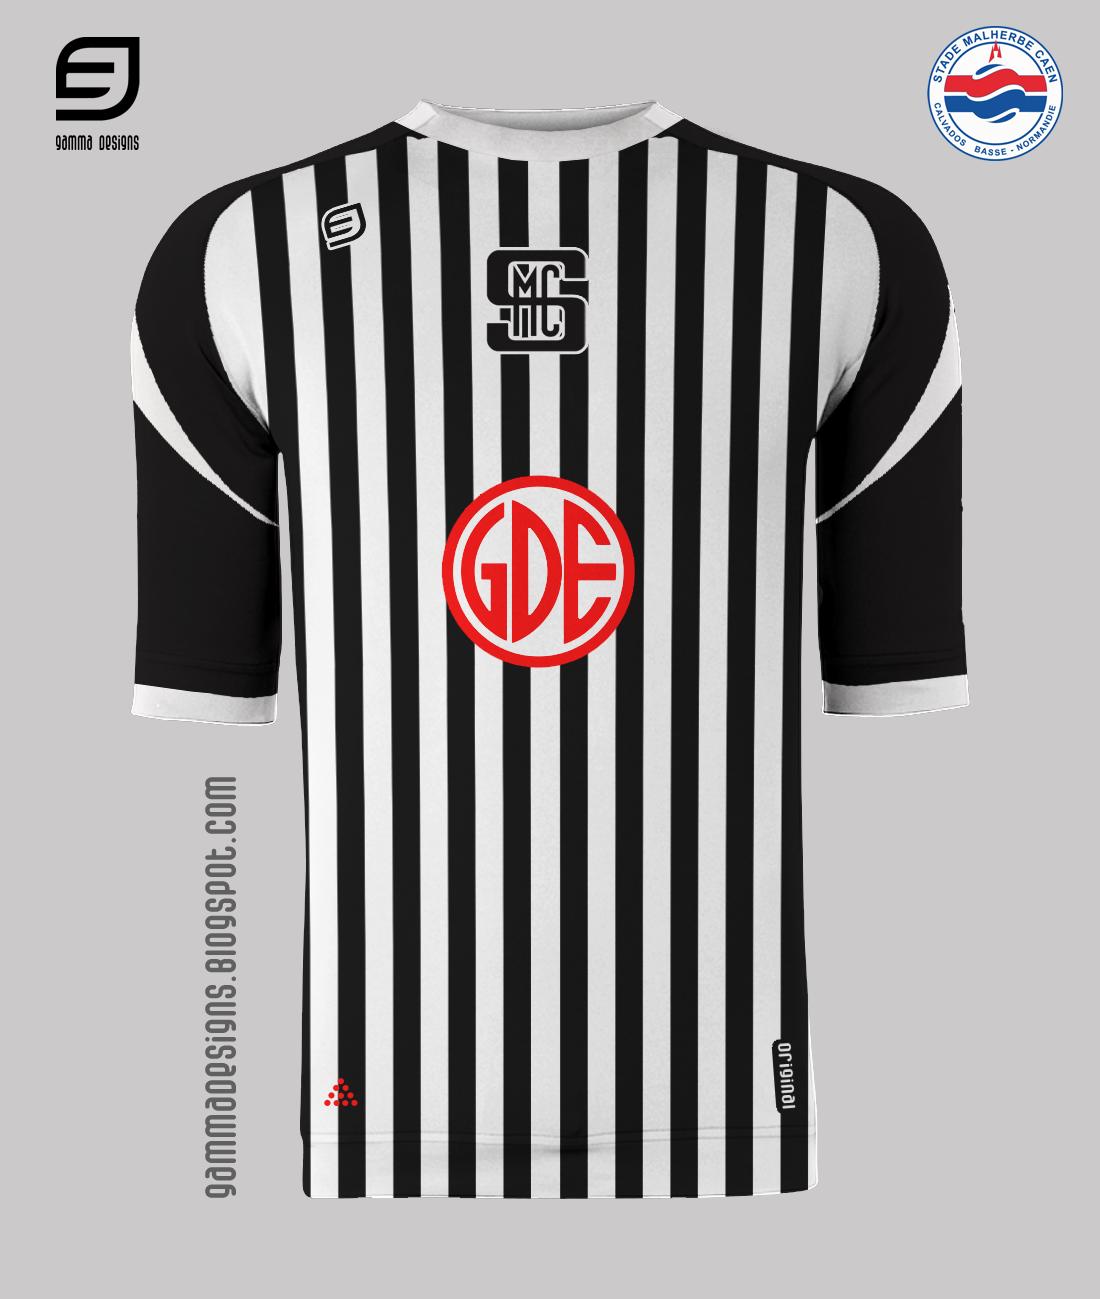 Gamma designs small tribute to ligue 2 caen for Inter home design